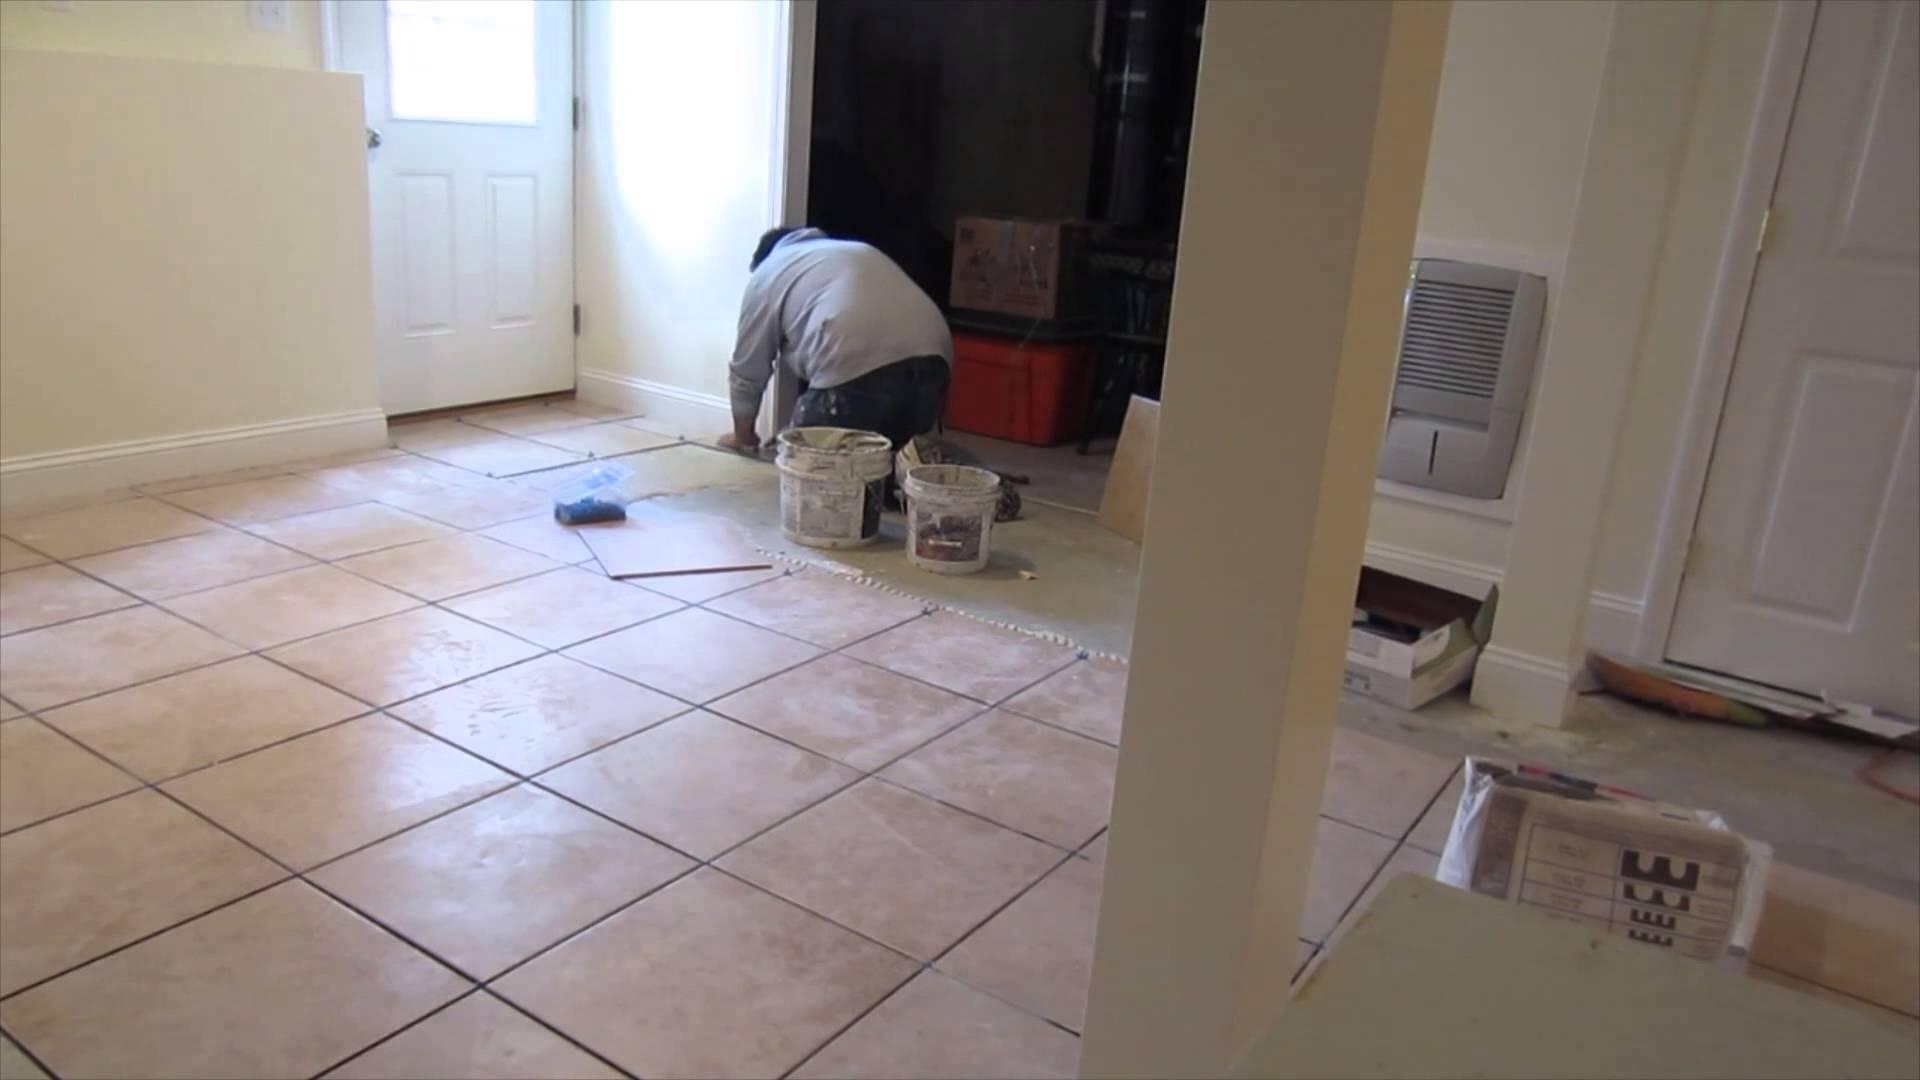 Tile Over Concrete Basement Floor